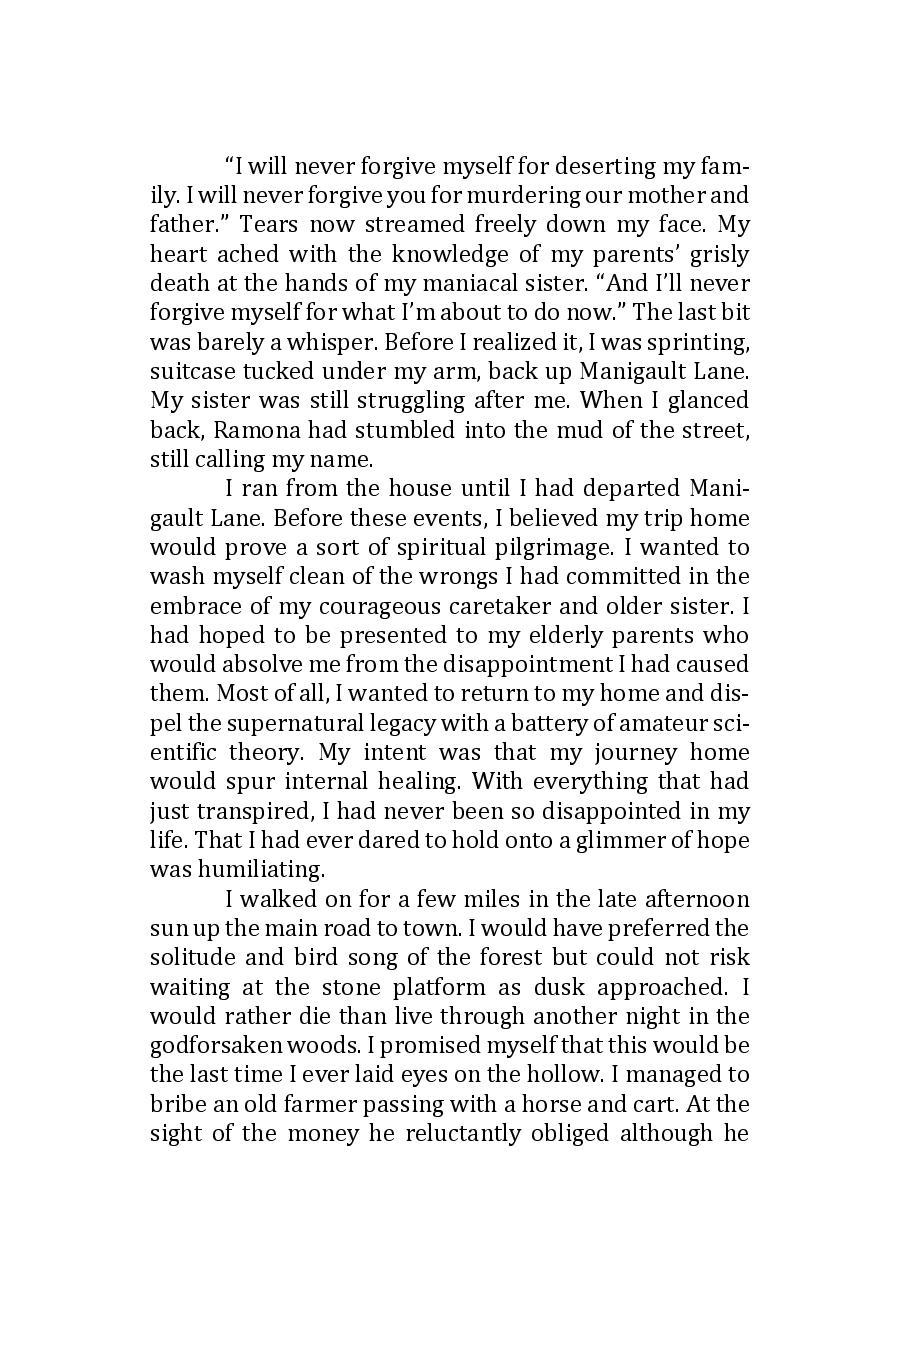 Hinnom Magazine 002 Manuscript E-Book 2-page-144